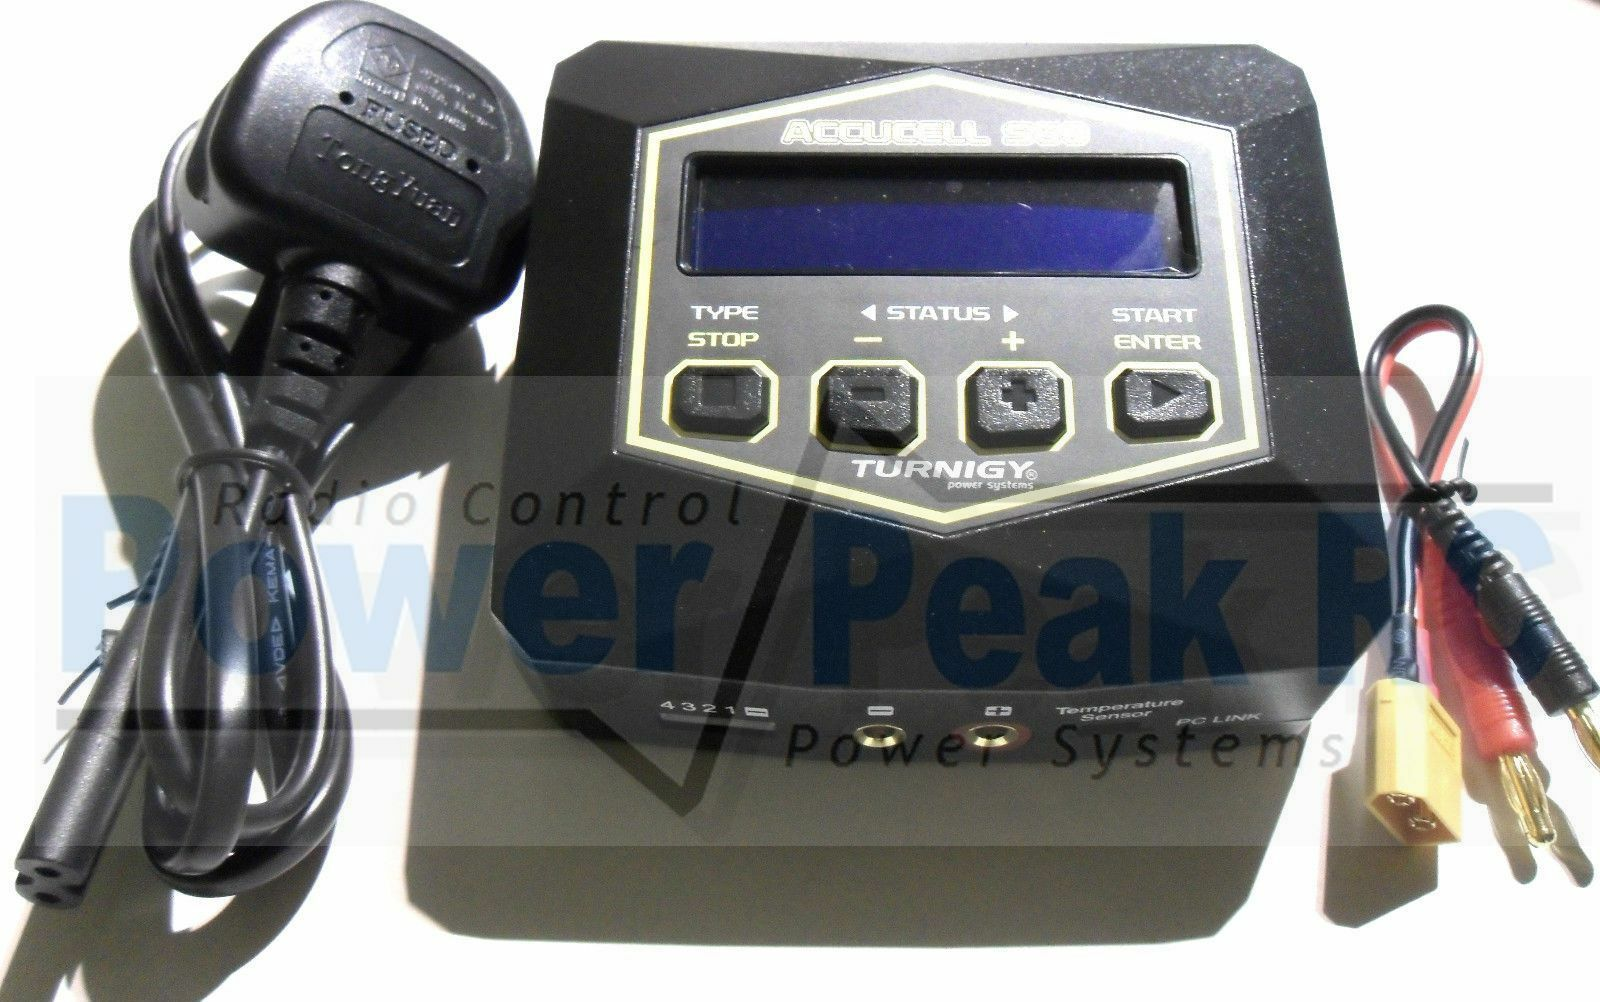 Turnigy Accucel S60 LiPo NiMH Battery Balance Charger 60w 6A 2s - 4s UK EU Plug